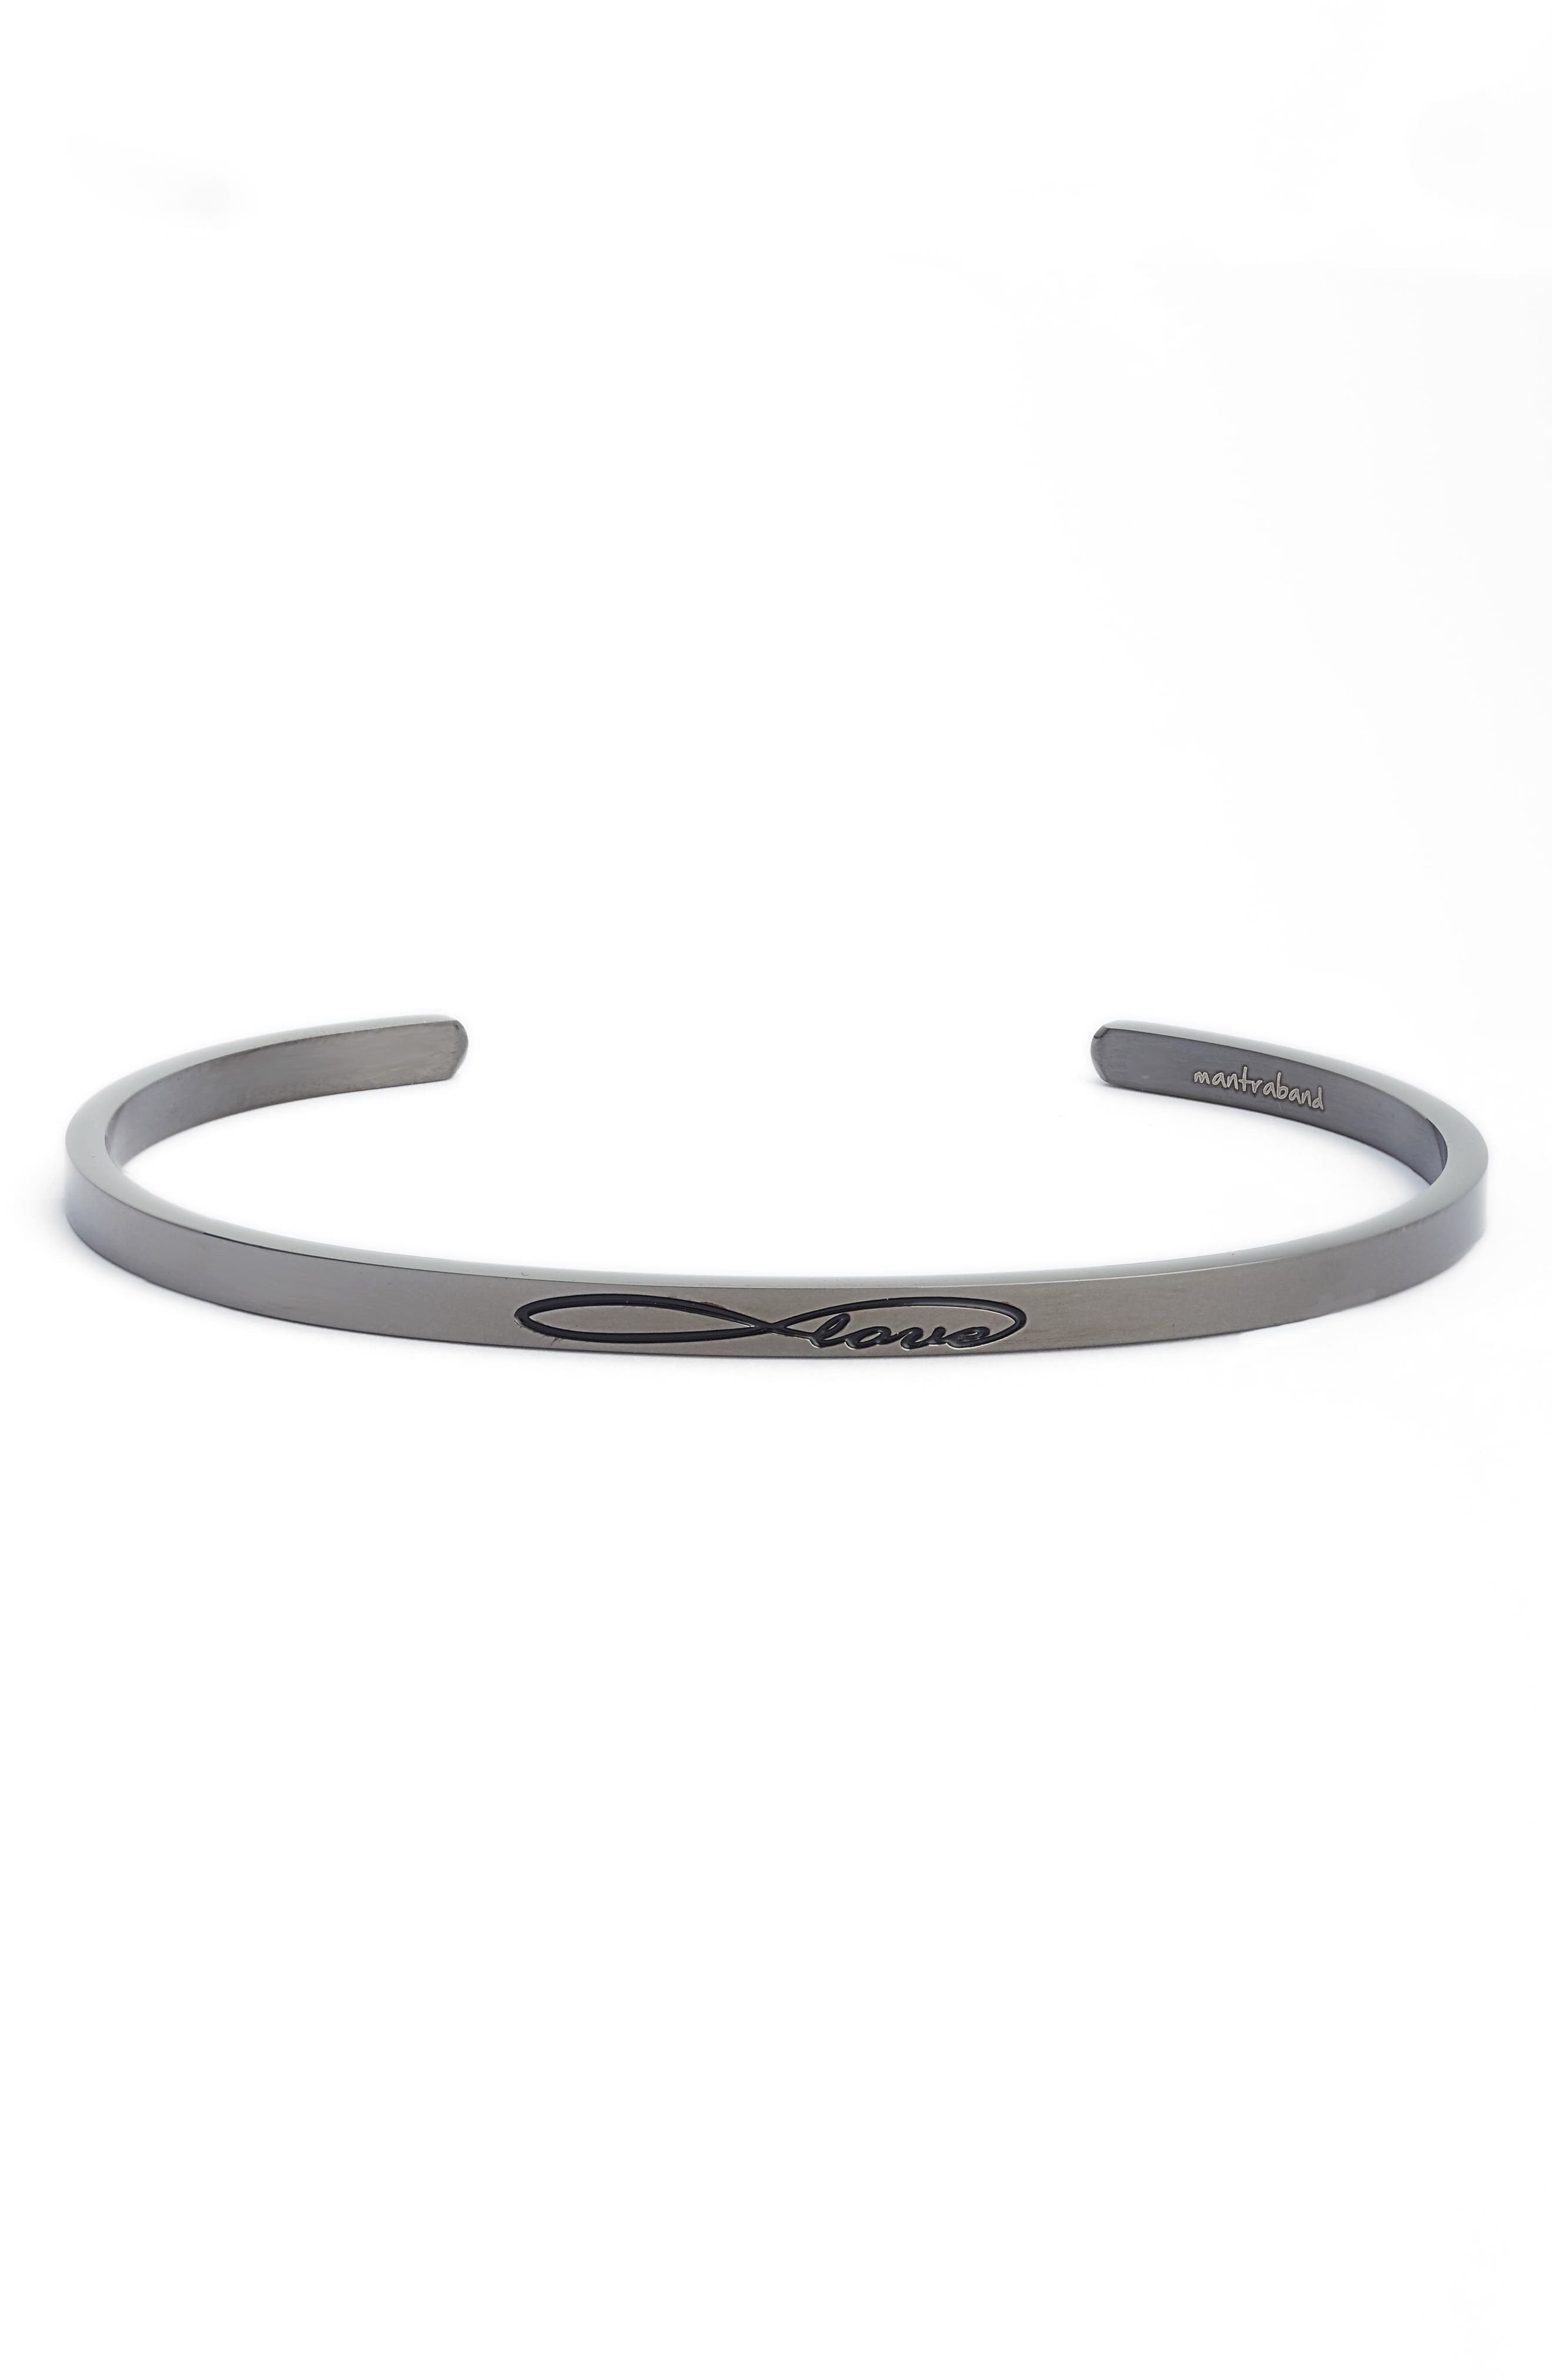 Infinite Love Cuff Bracelet,                         Main,                         color, Moon Gray